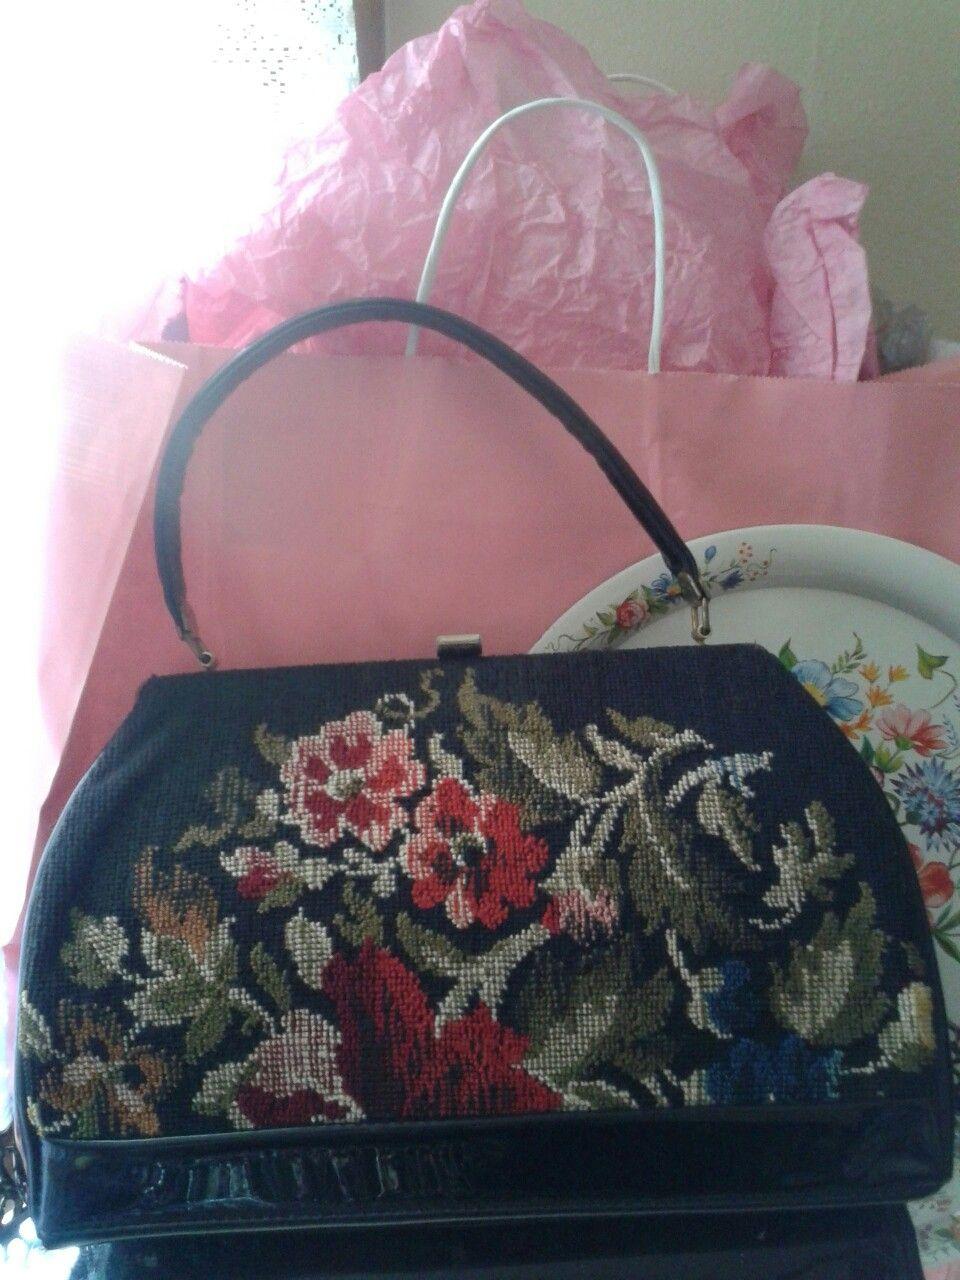 #vintagepurse #vintage #vintagehandbag #needlepointhandbag Needlepoint bag available for purchase at https://www.spreesy.com/SpringzzEternal